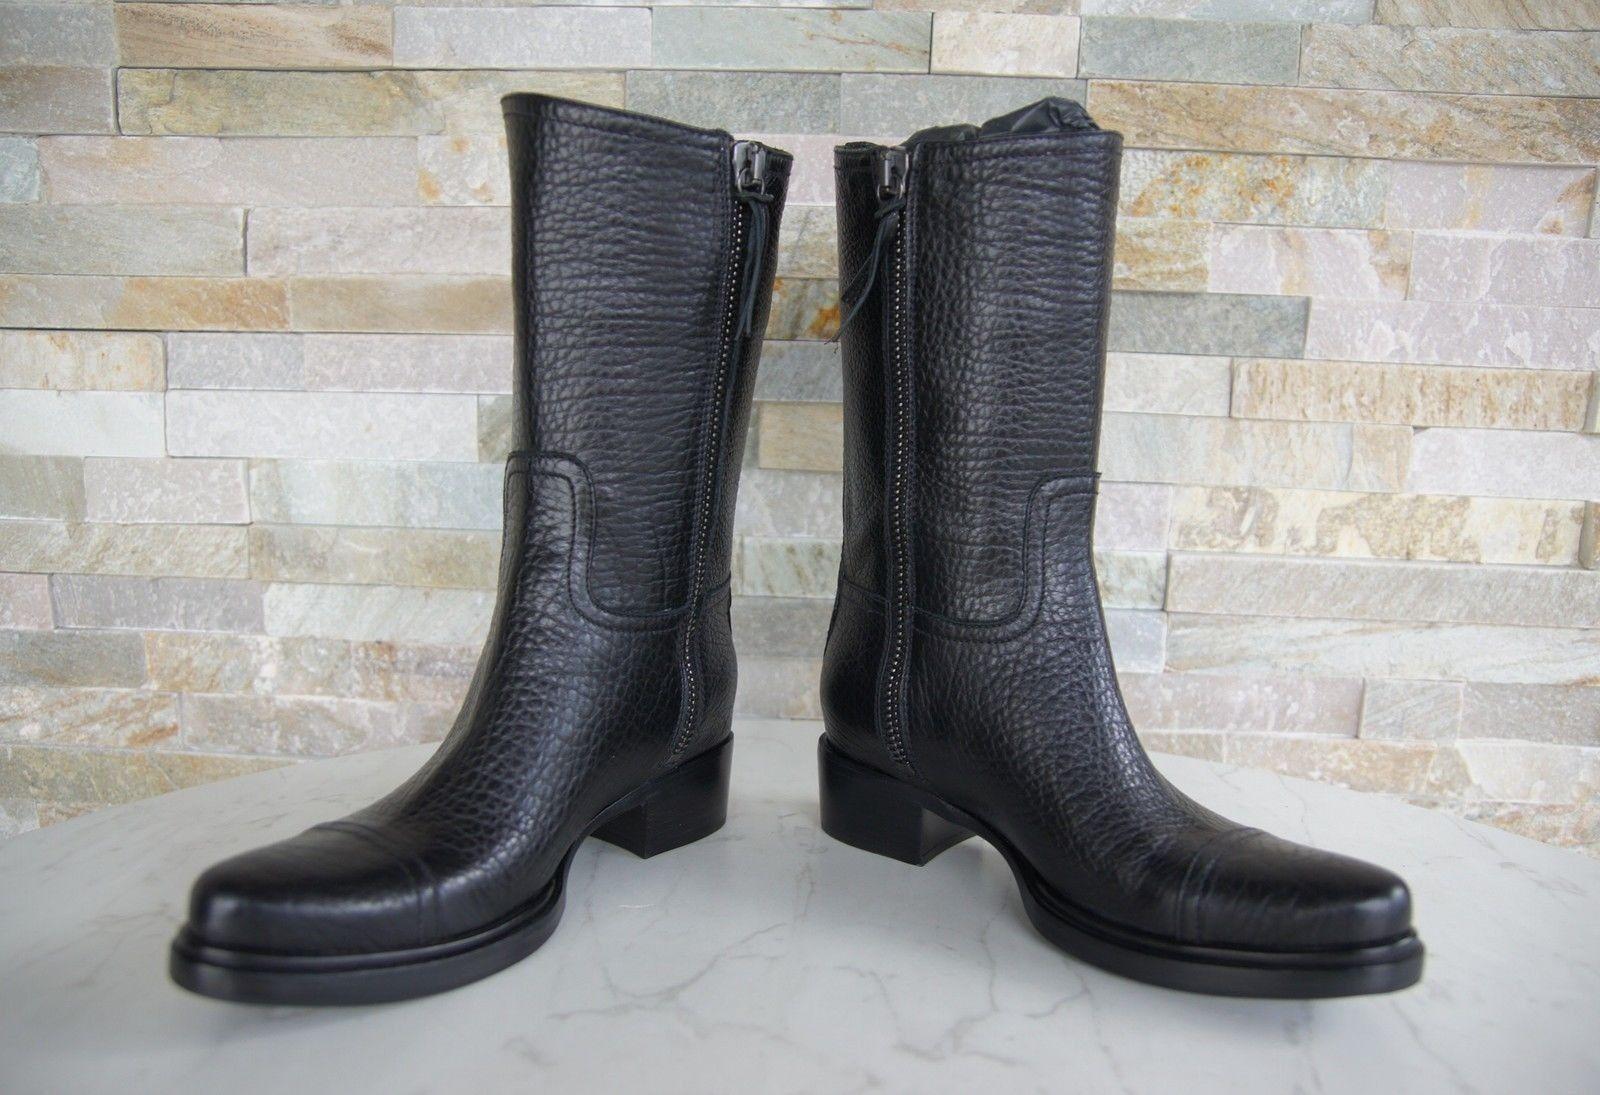 MIU MIU Bisonleder Gr 36,5 Damen Stiefel Stiefel Schuhe Bisonleder MIU 5U8936 schwarz NEU 41a89d